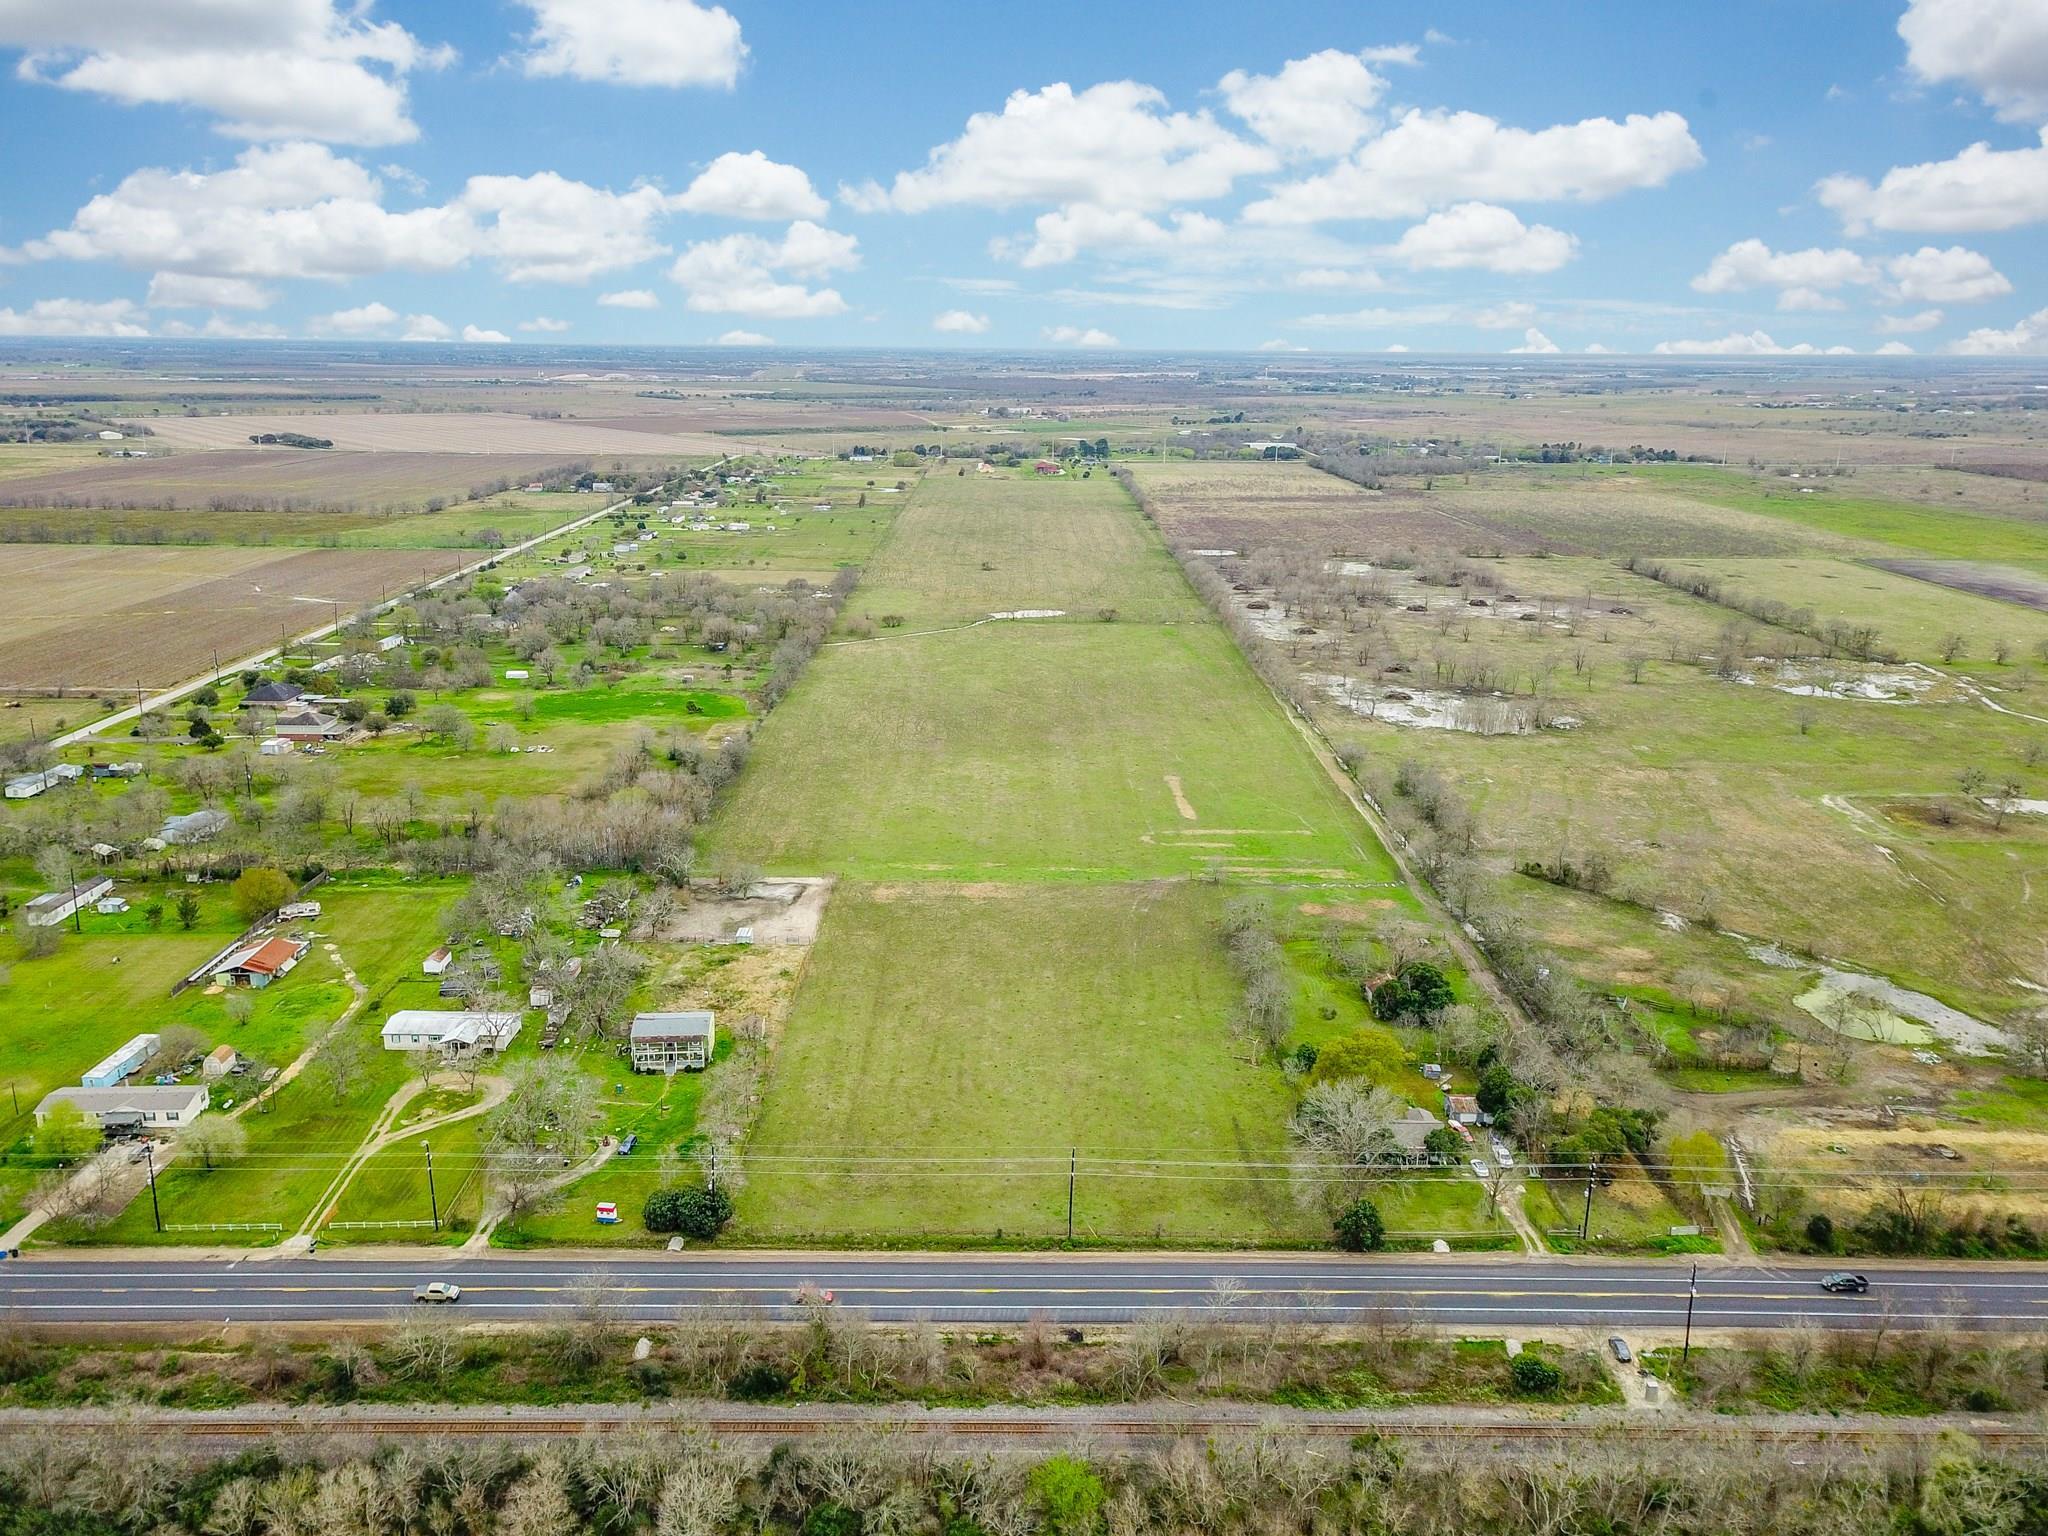 6027 HIGHWAY 90a Property Photo - Rosenberg, TX real estate listing